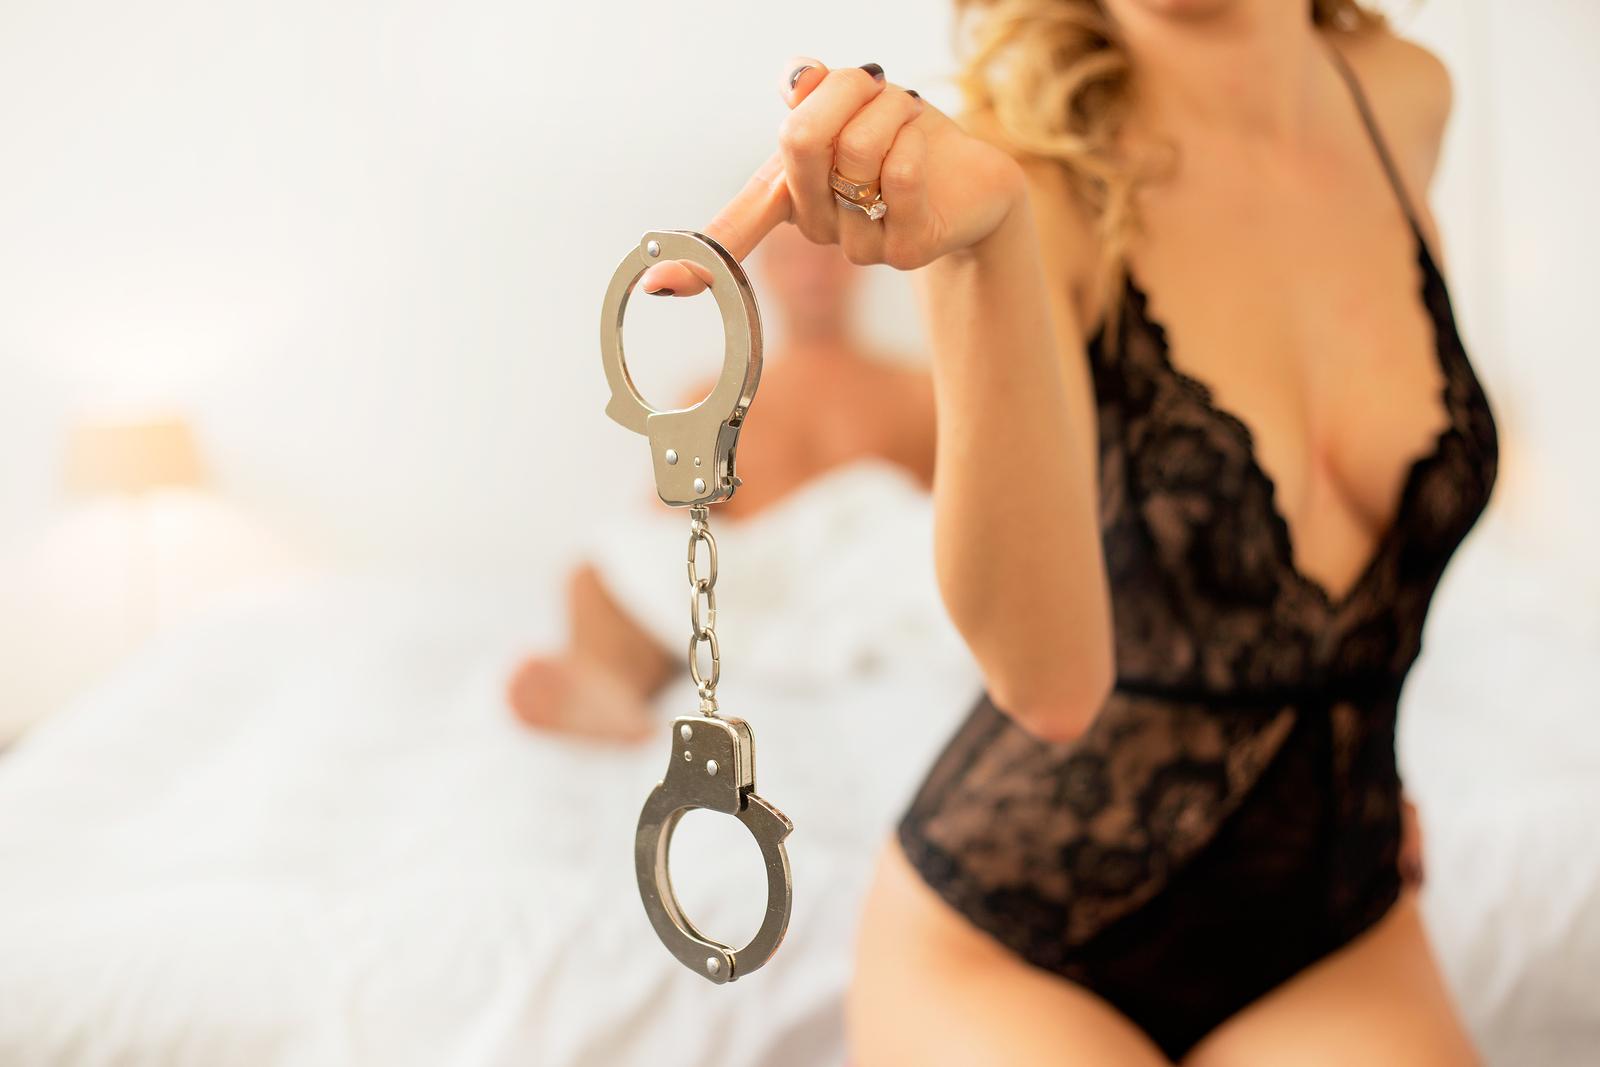 bigstock Woman holding handcuffs 109448591